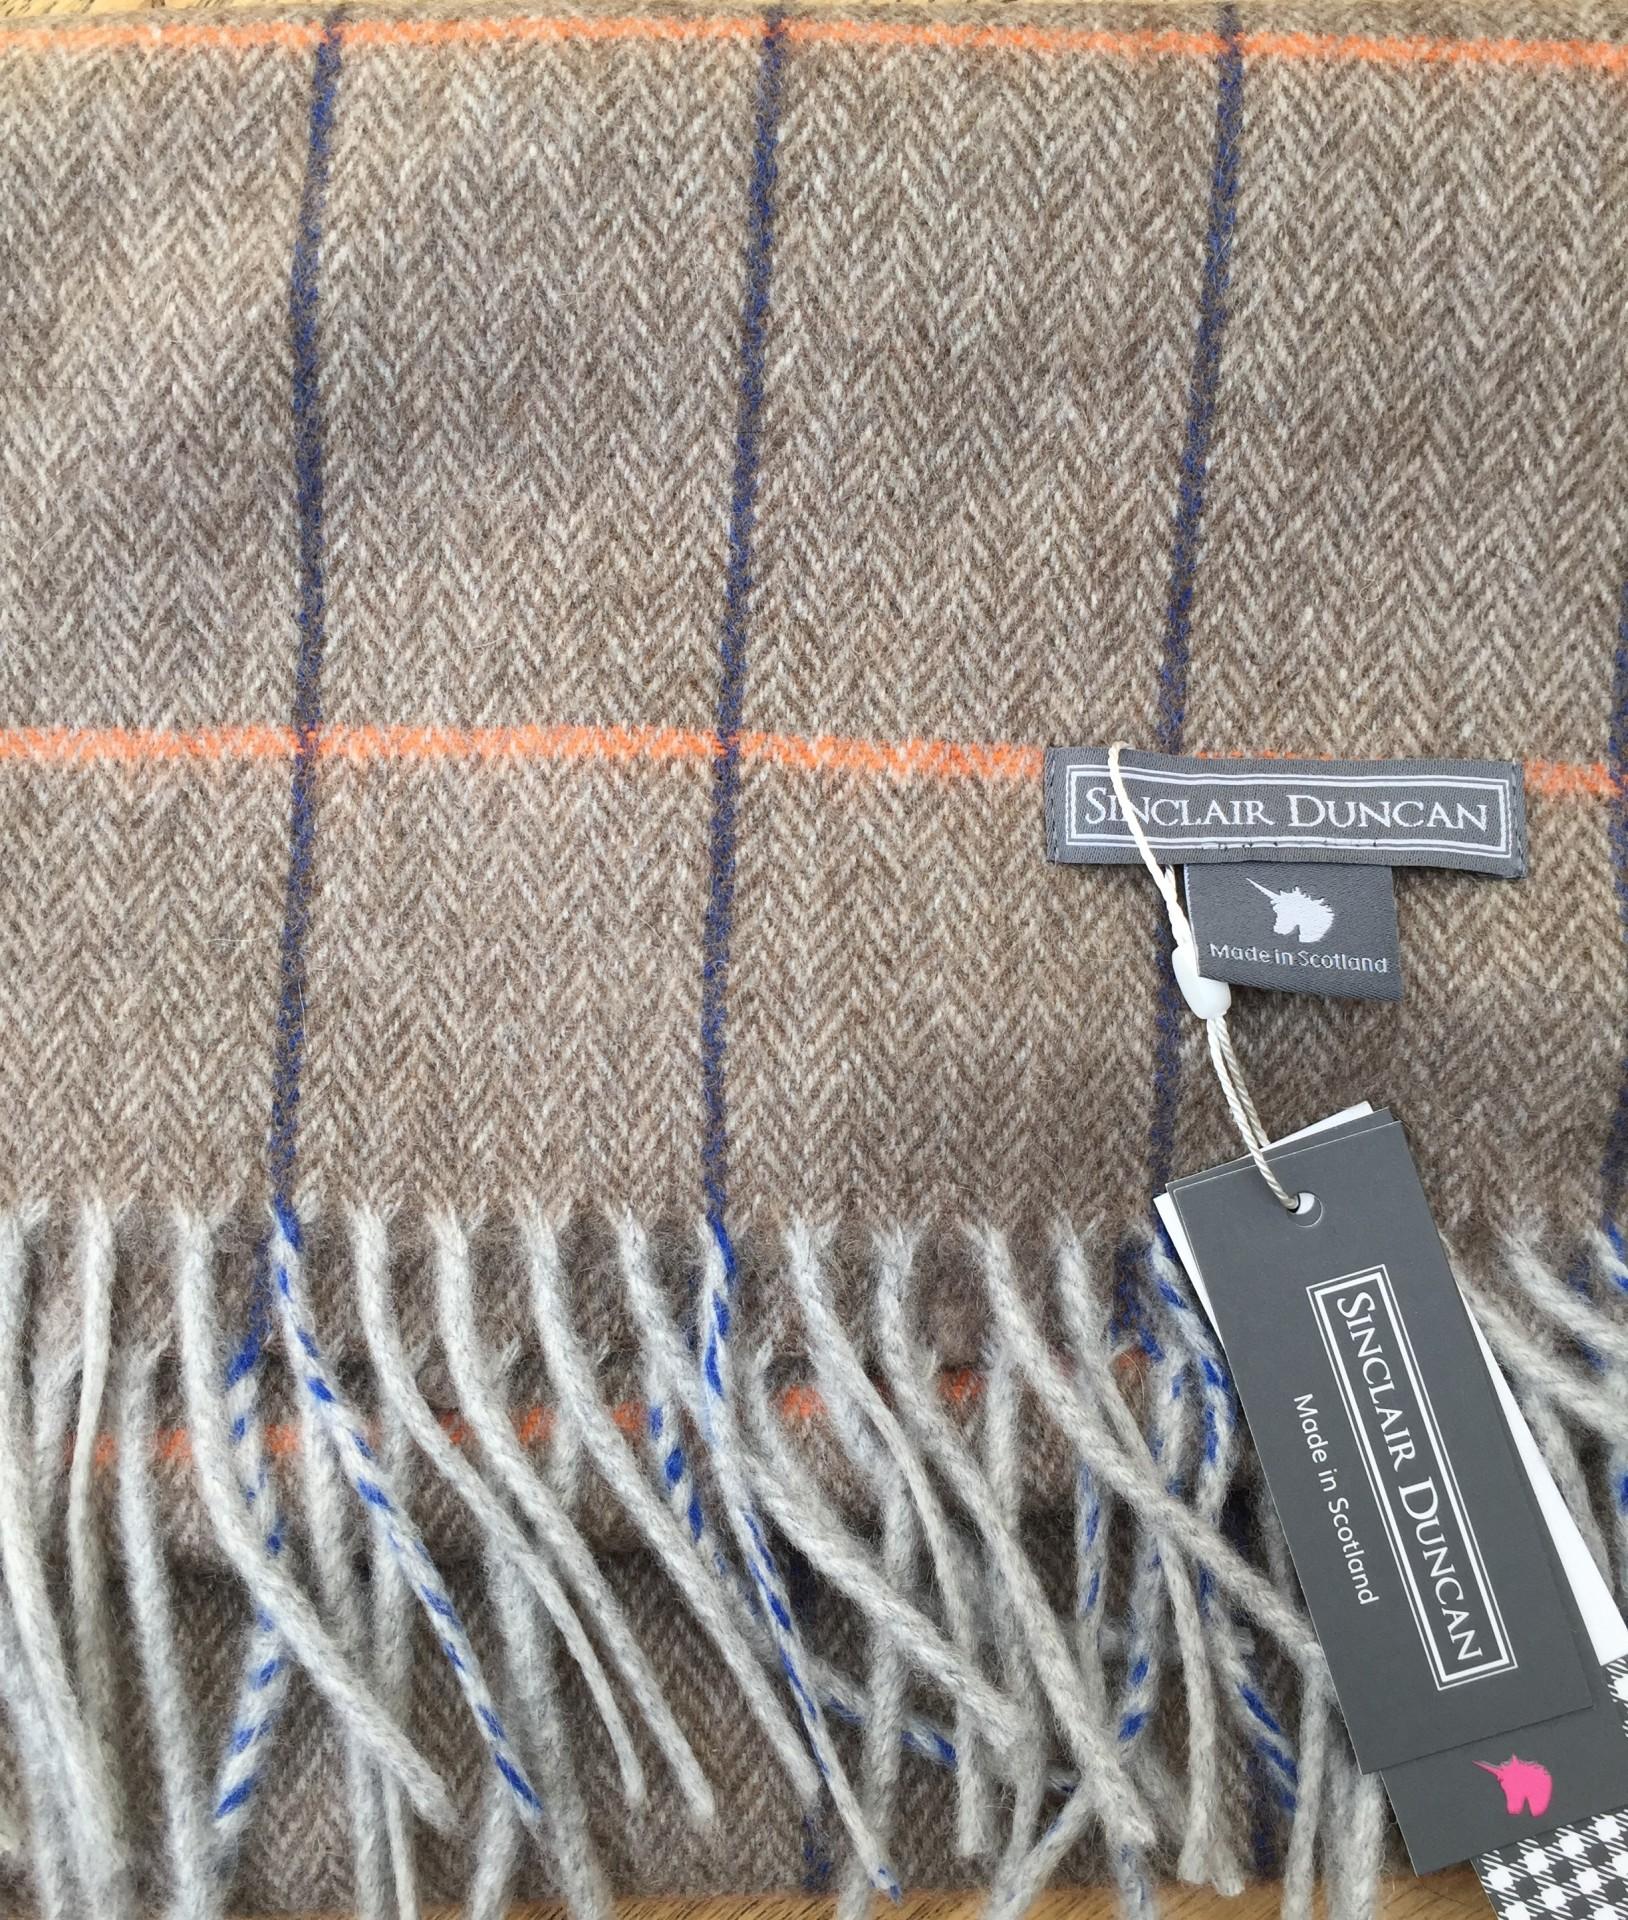 Brown tweed Cashmere scarf